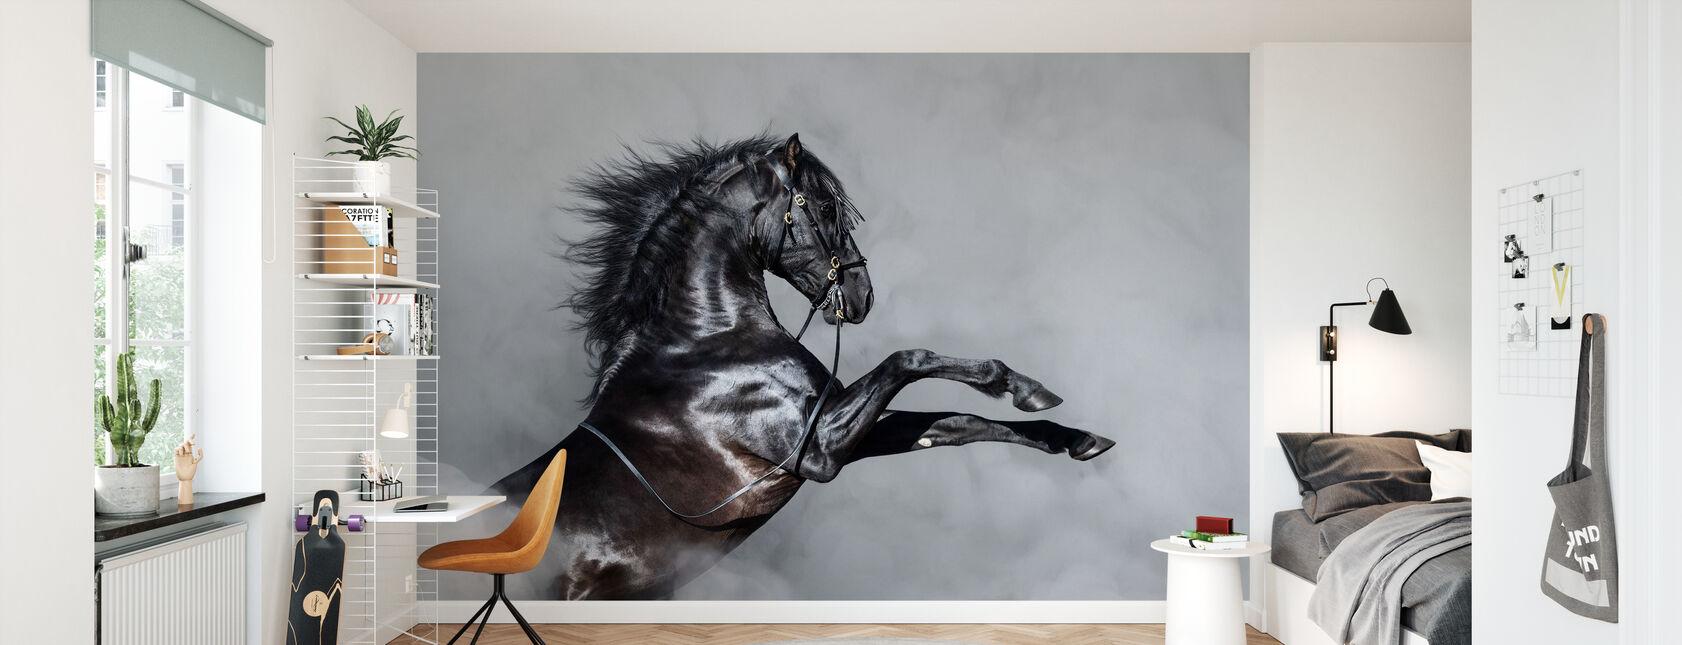 Horse Rearing in Smoke - Wallpaper - Kids Room